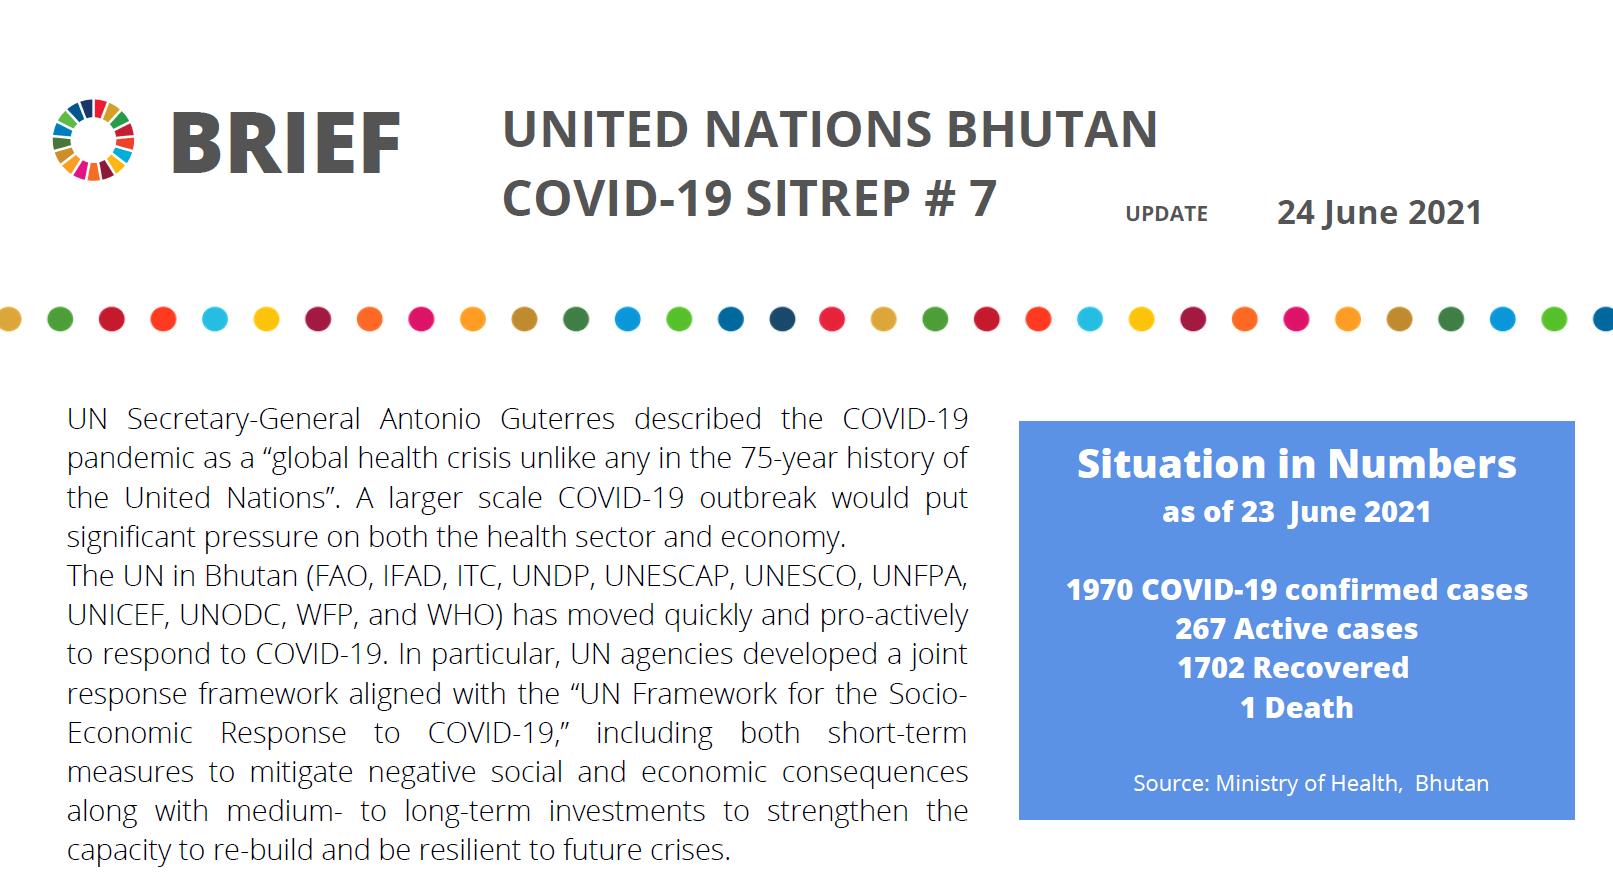 [Summary: 2 pages] UN Bhutan COVID-19 Sitrep #7